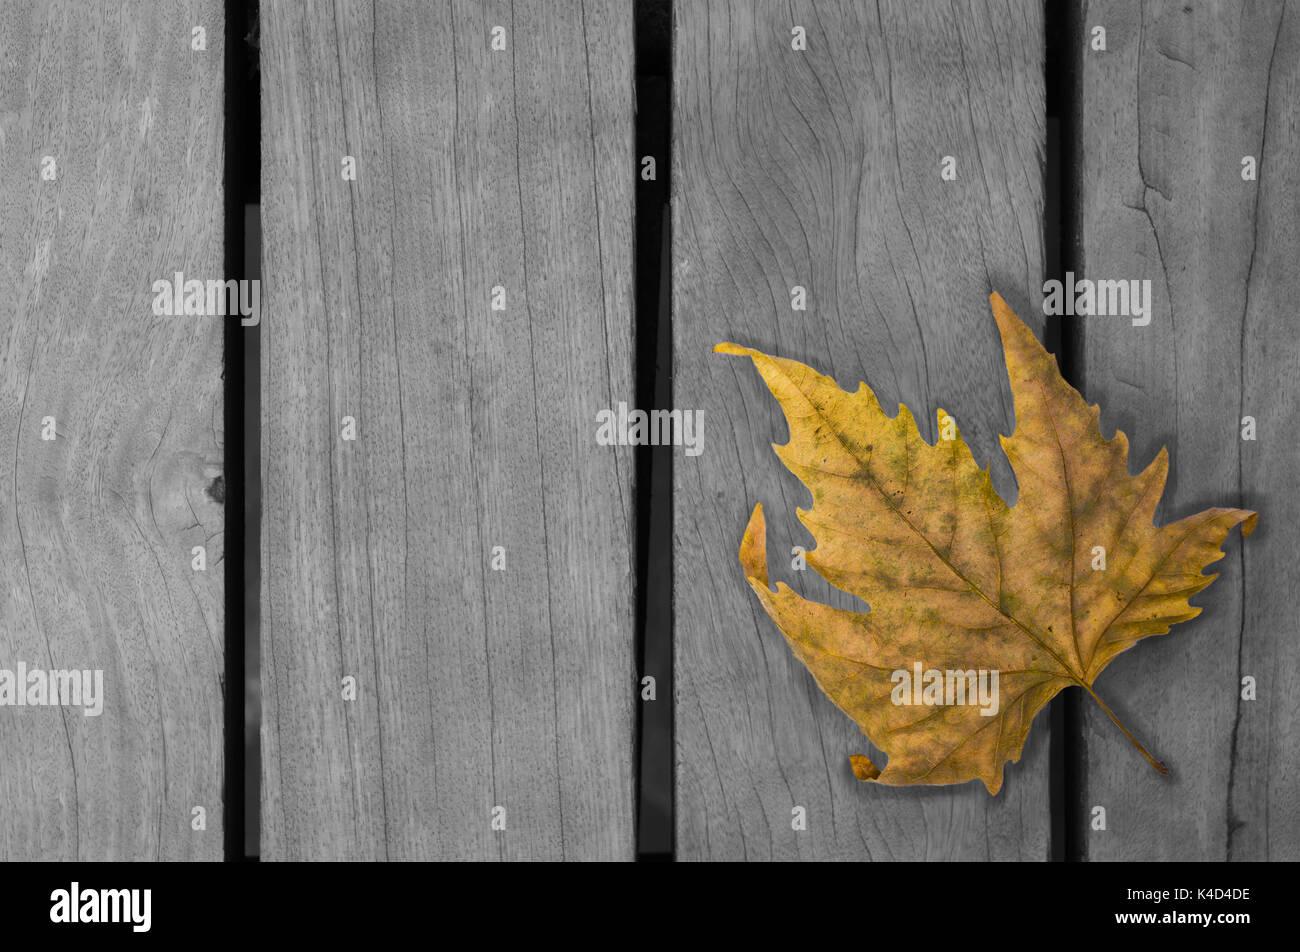 Leaf Vector Stockfotos & Leaf Vector Bilder - Alamy